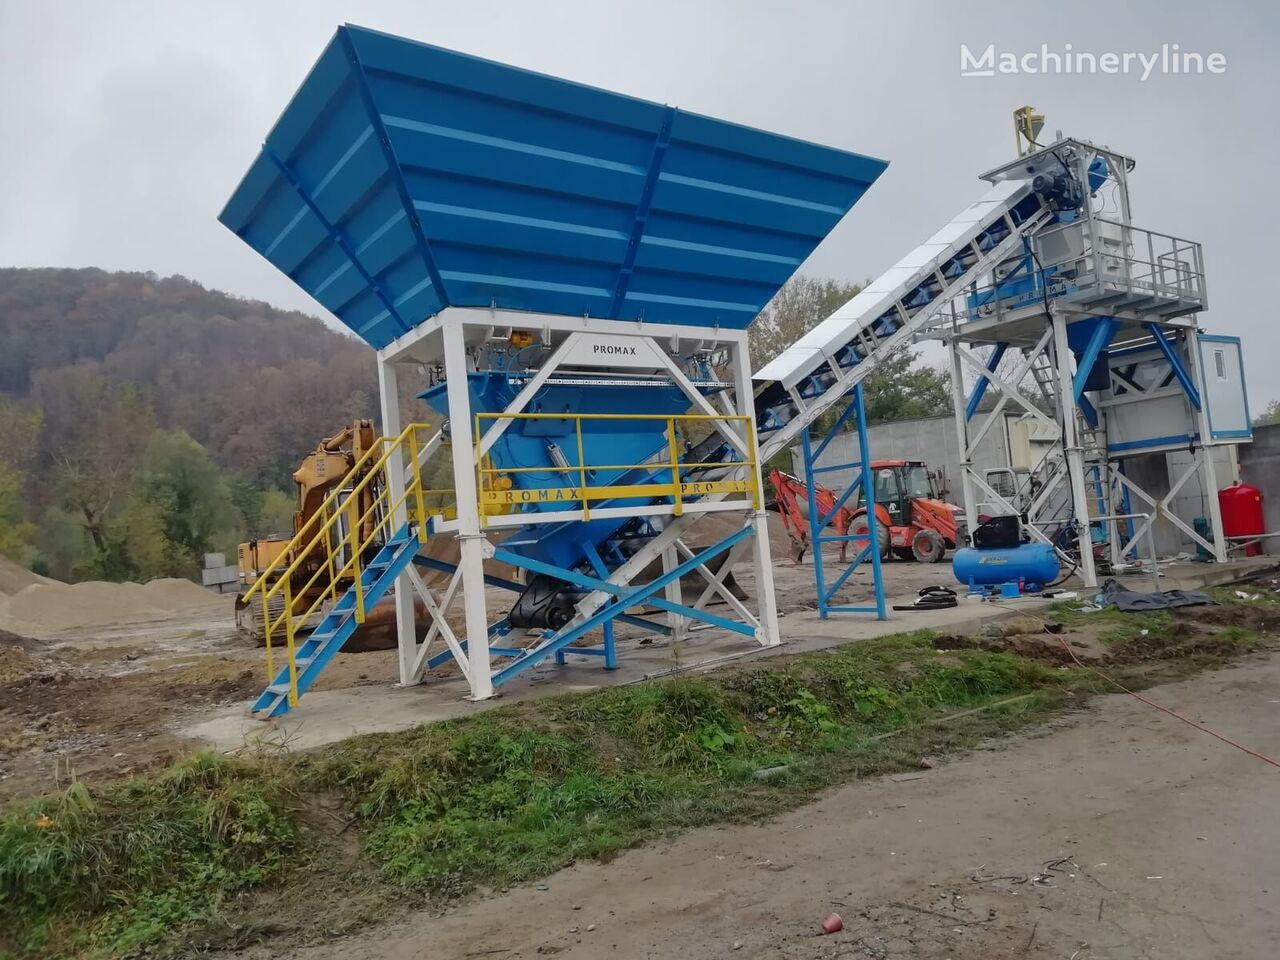 ny PROMAX Compact Concrete Batching Plant C60-SNG-PLUS (60m3/h) betongfabrikk